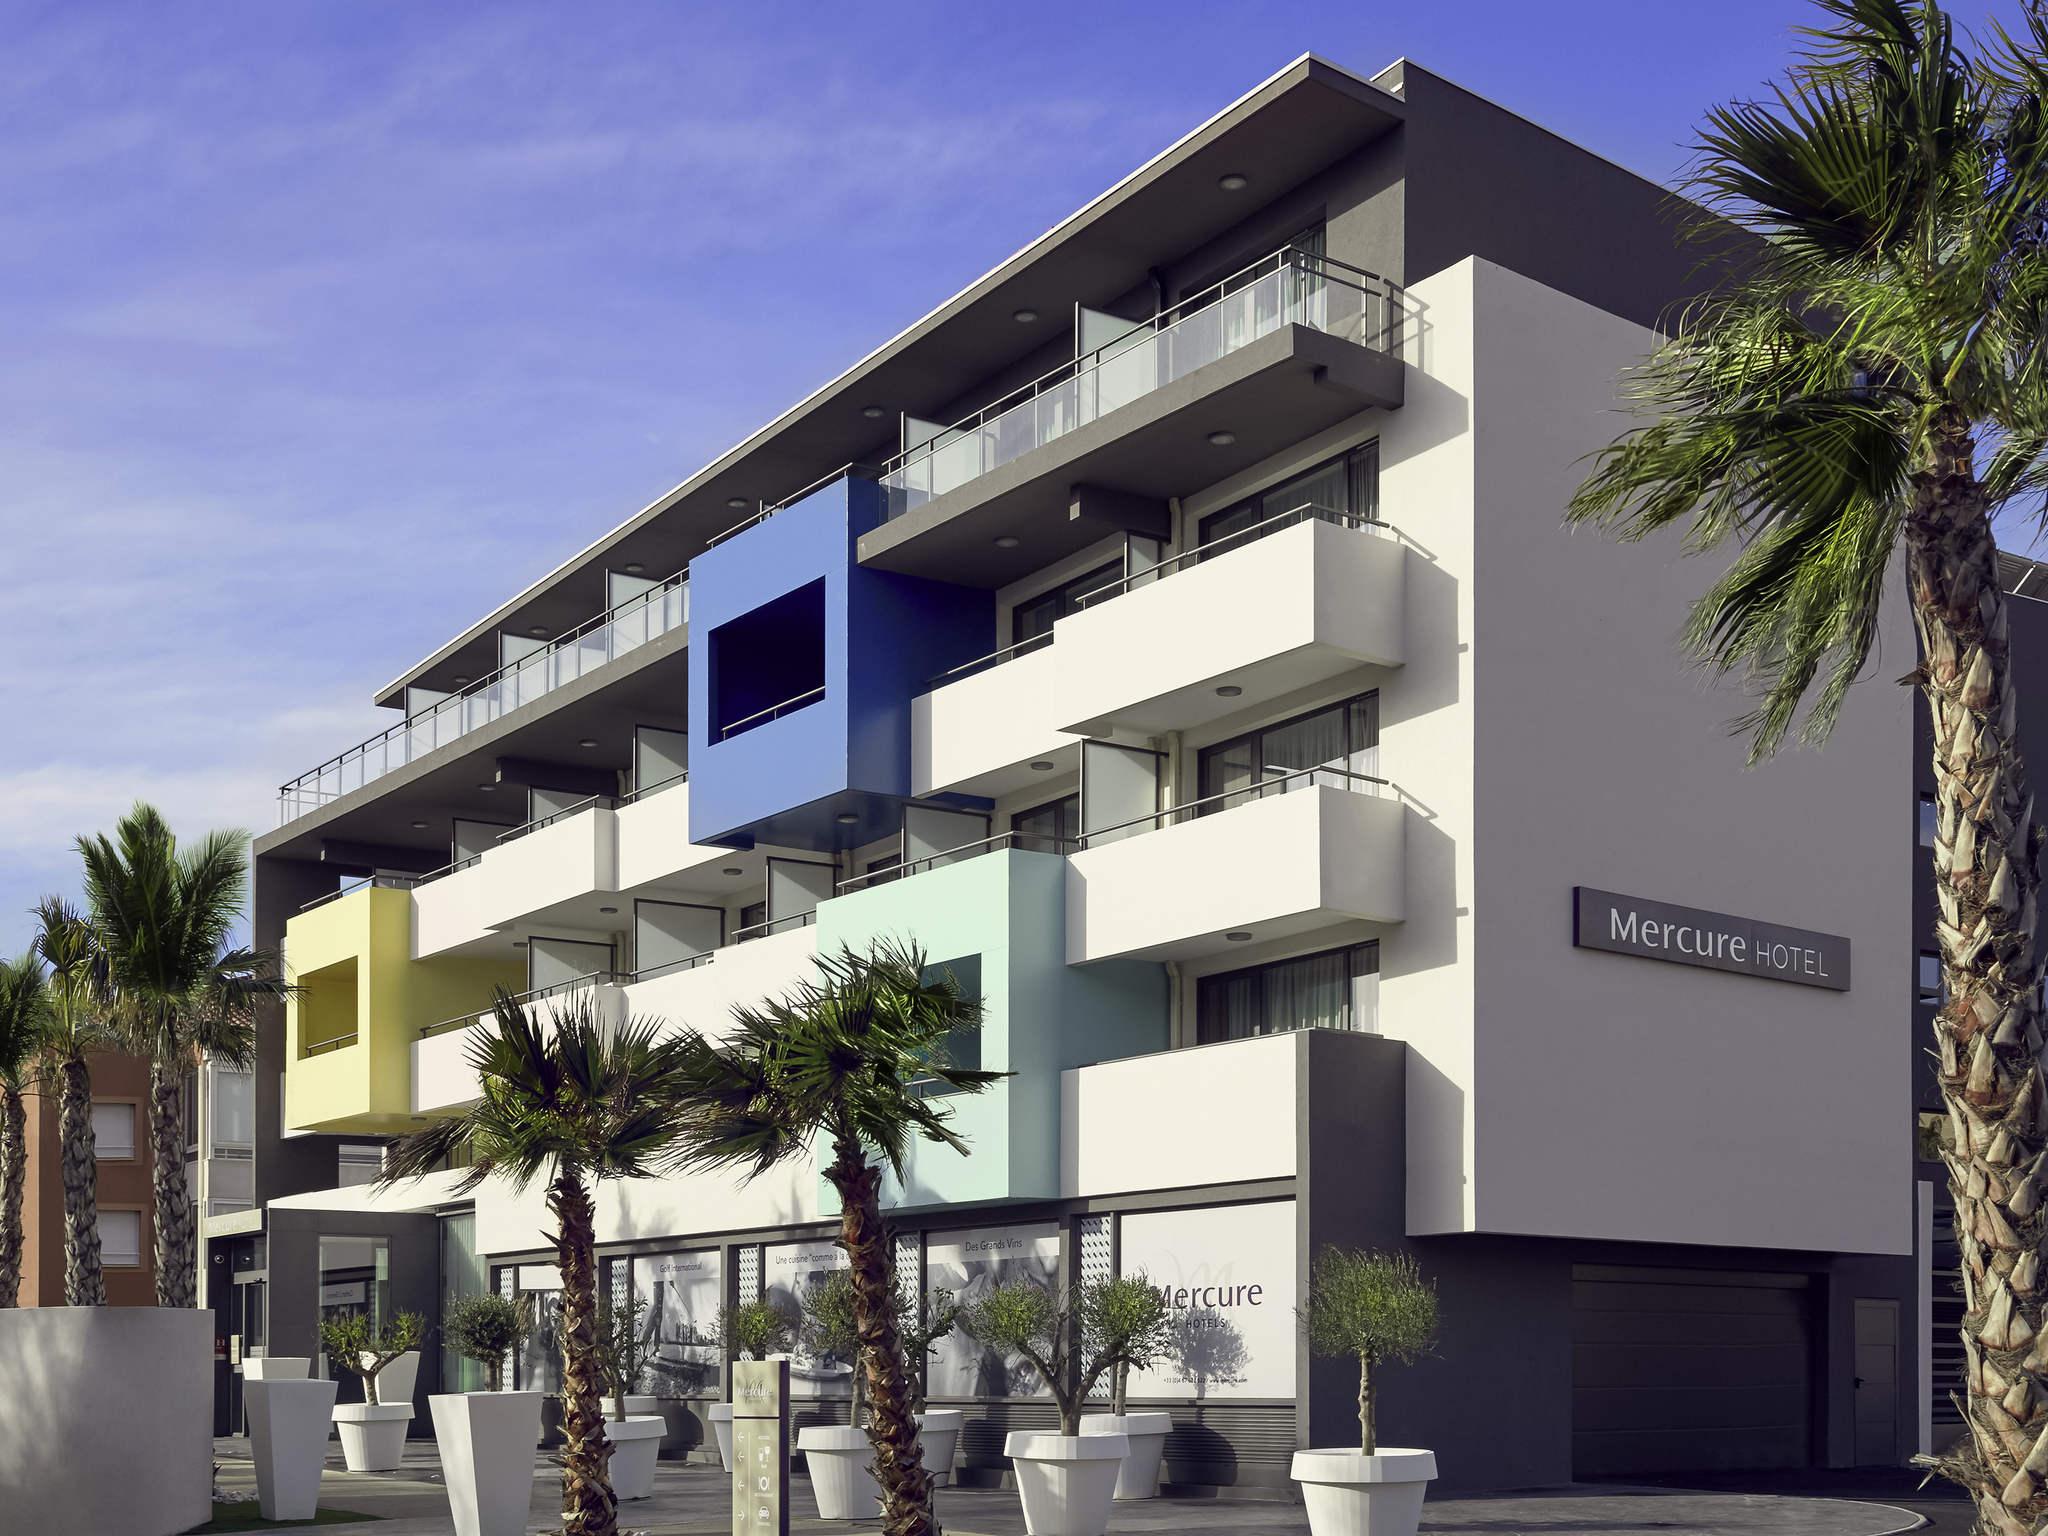 فندق - Hôtel Mercure Golf Cap d'Agde